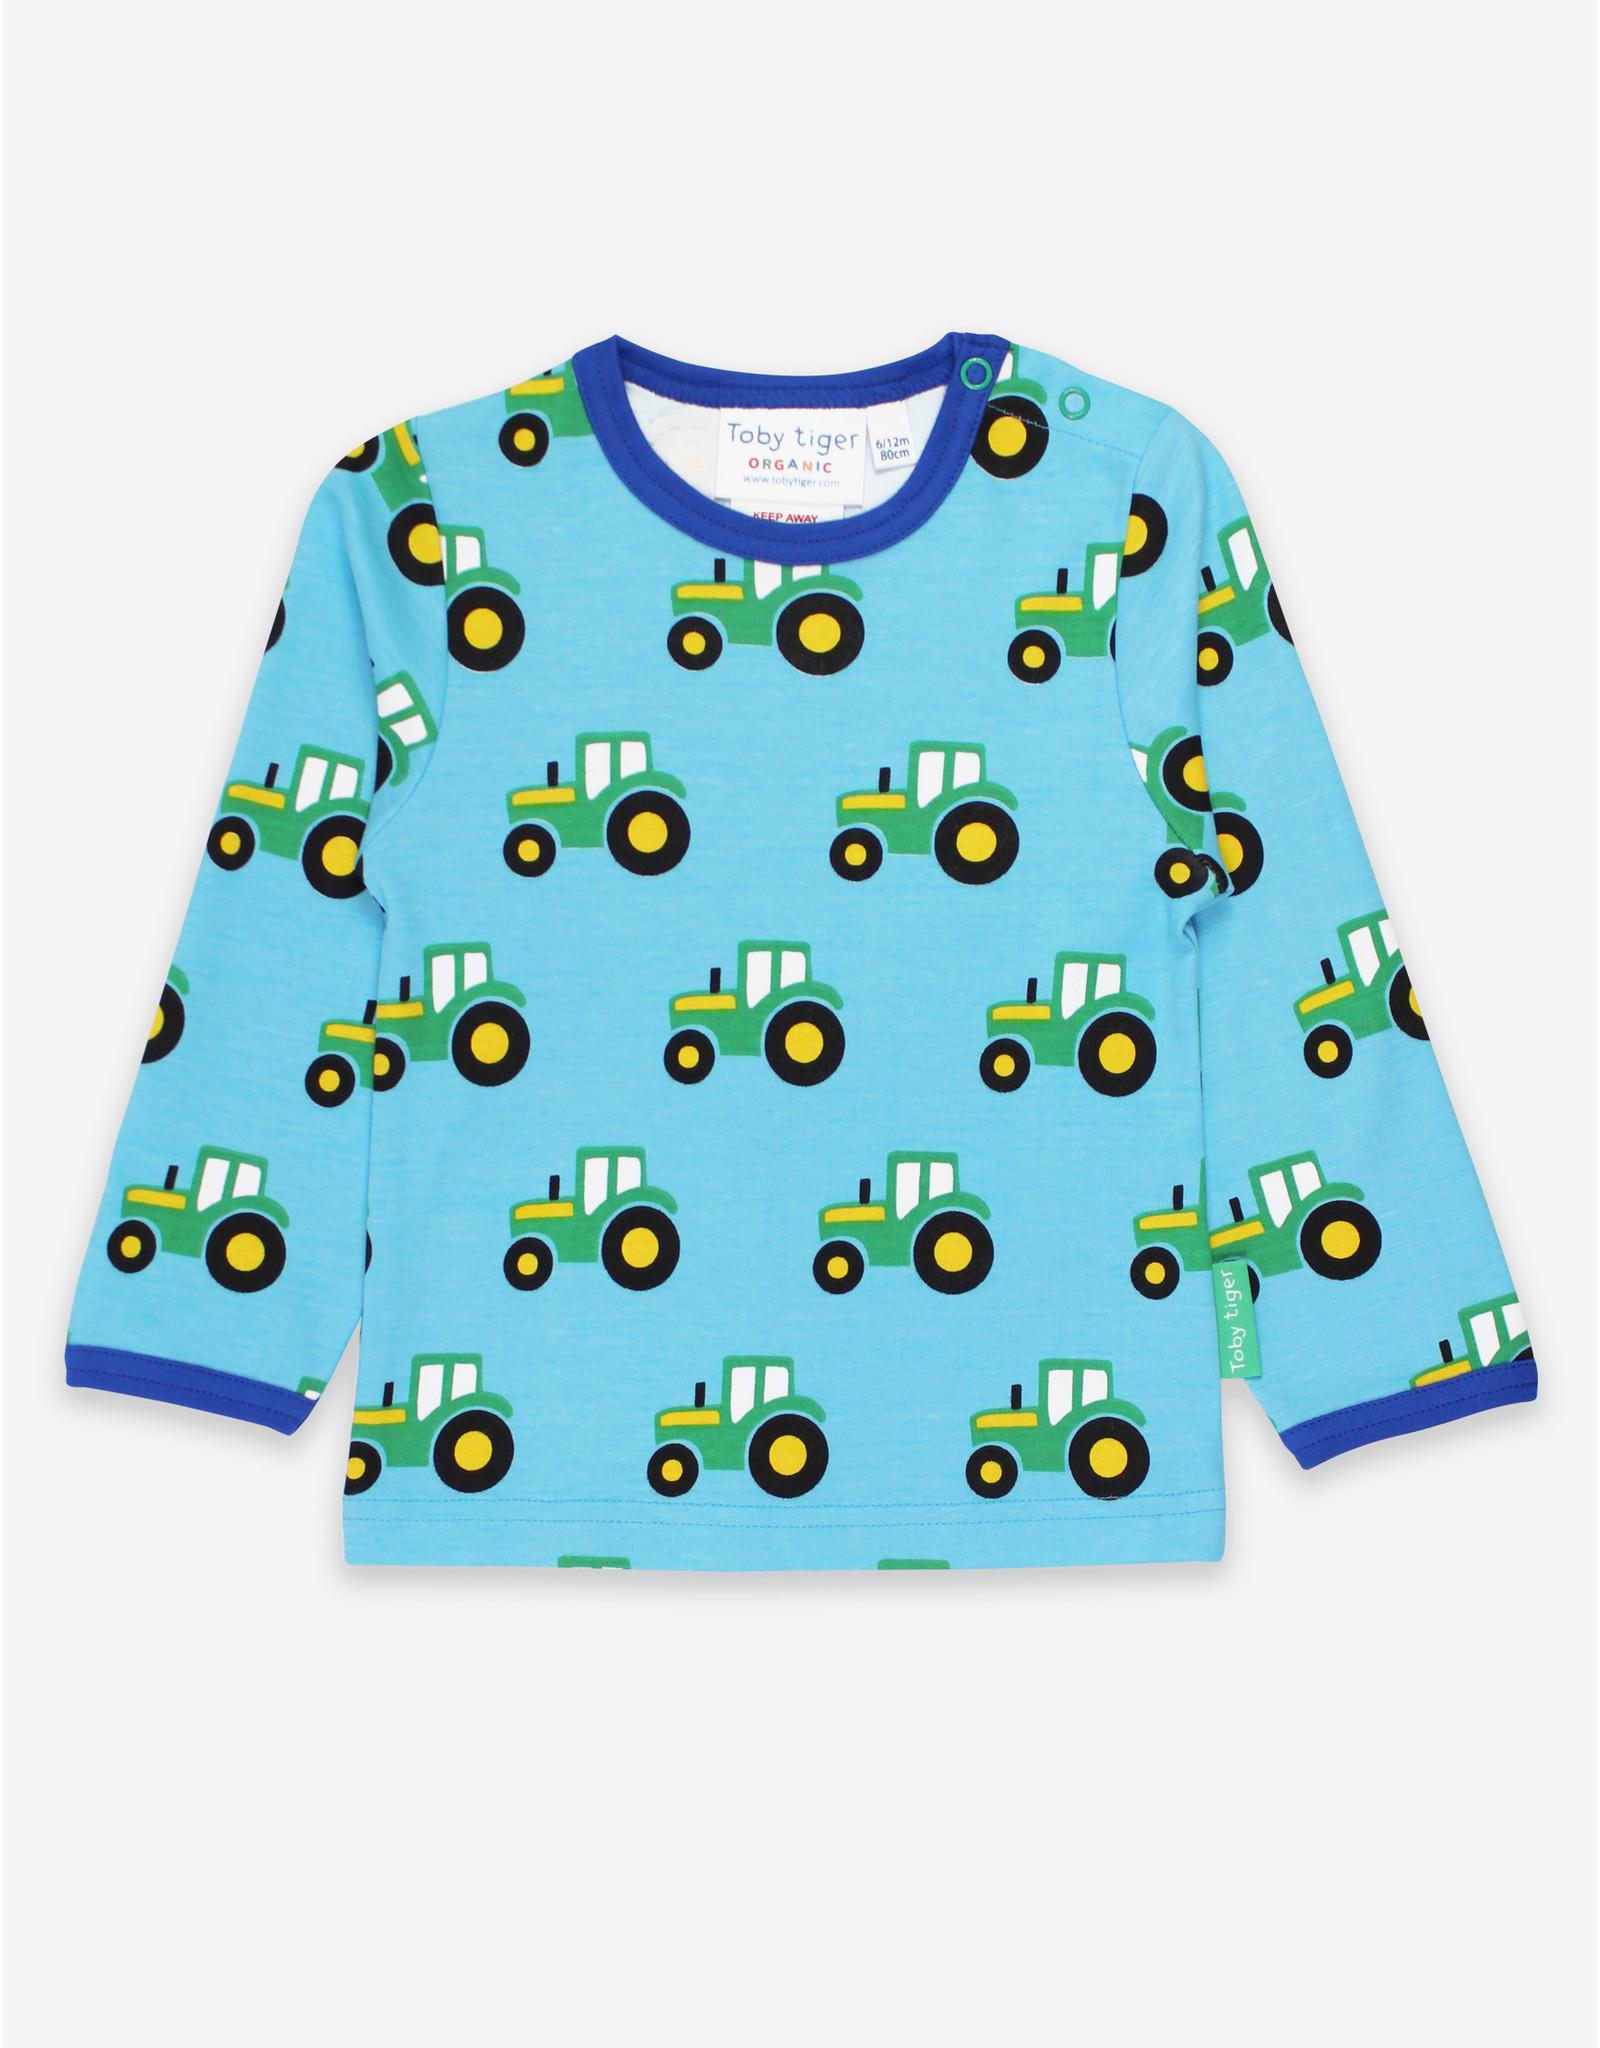 Toby Tiger Kinder shirt - tractor